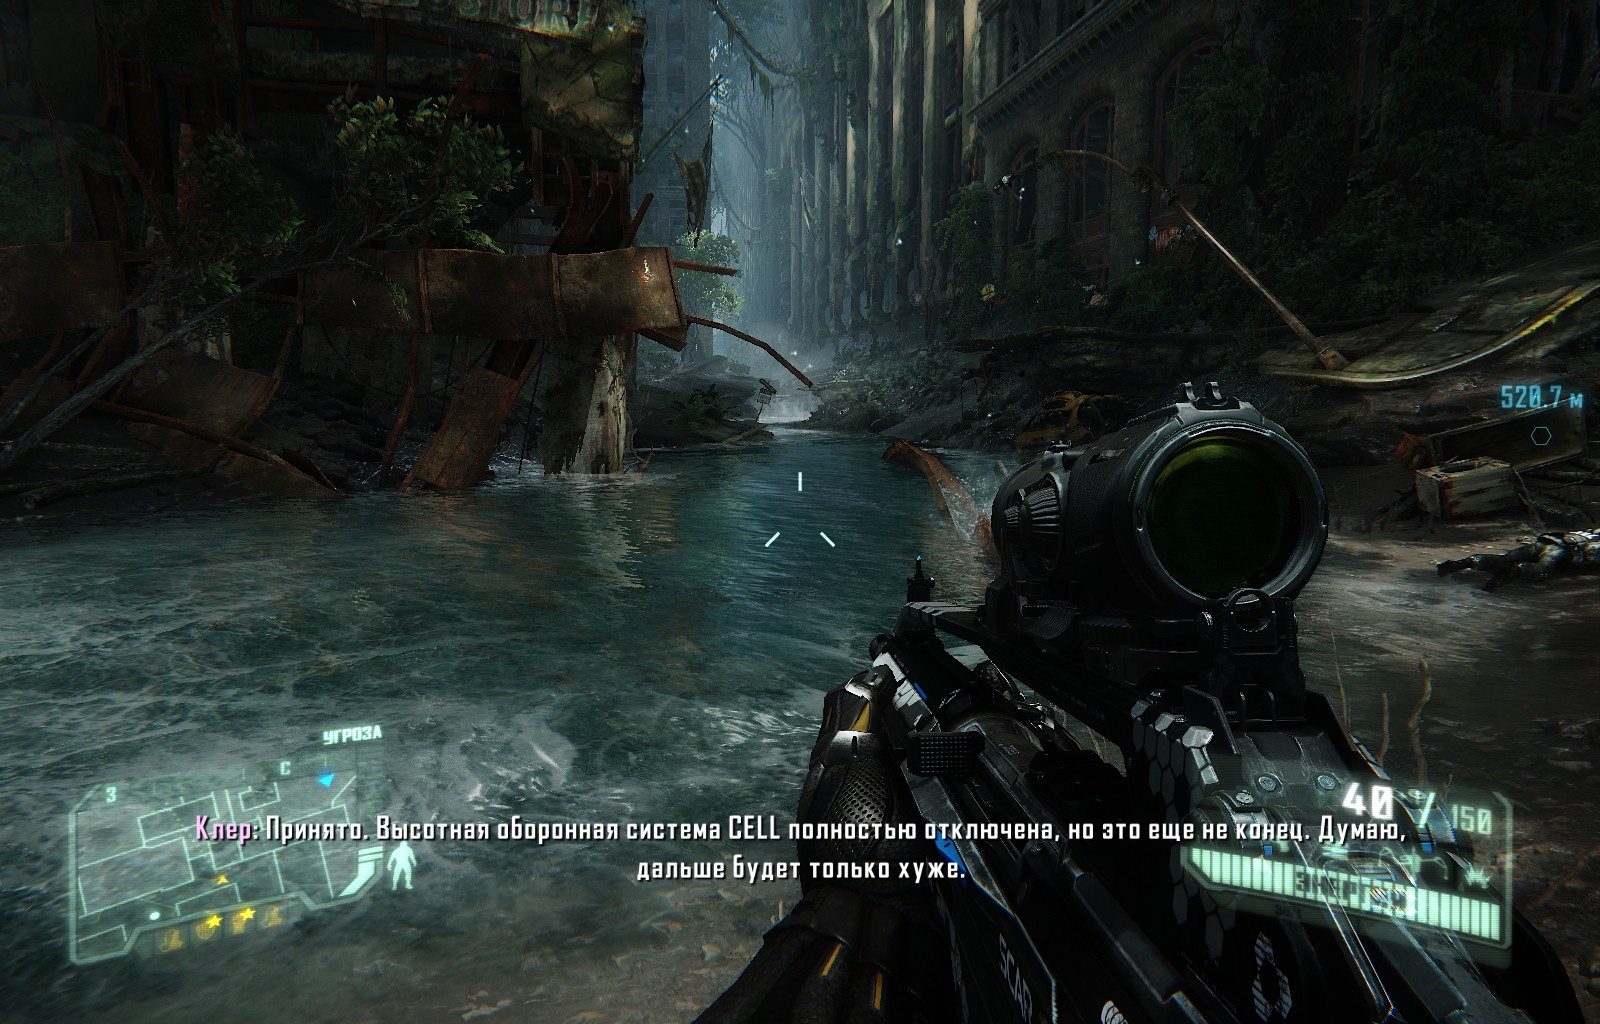 Green Water Fix At Skyrim Nexus скачать